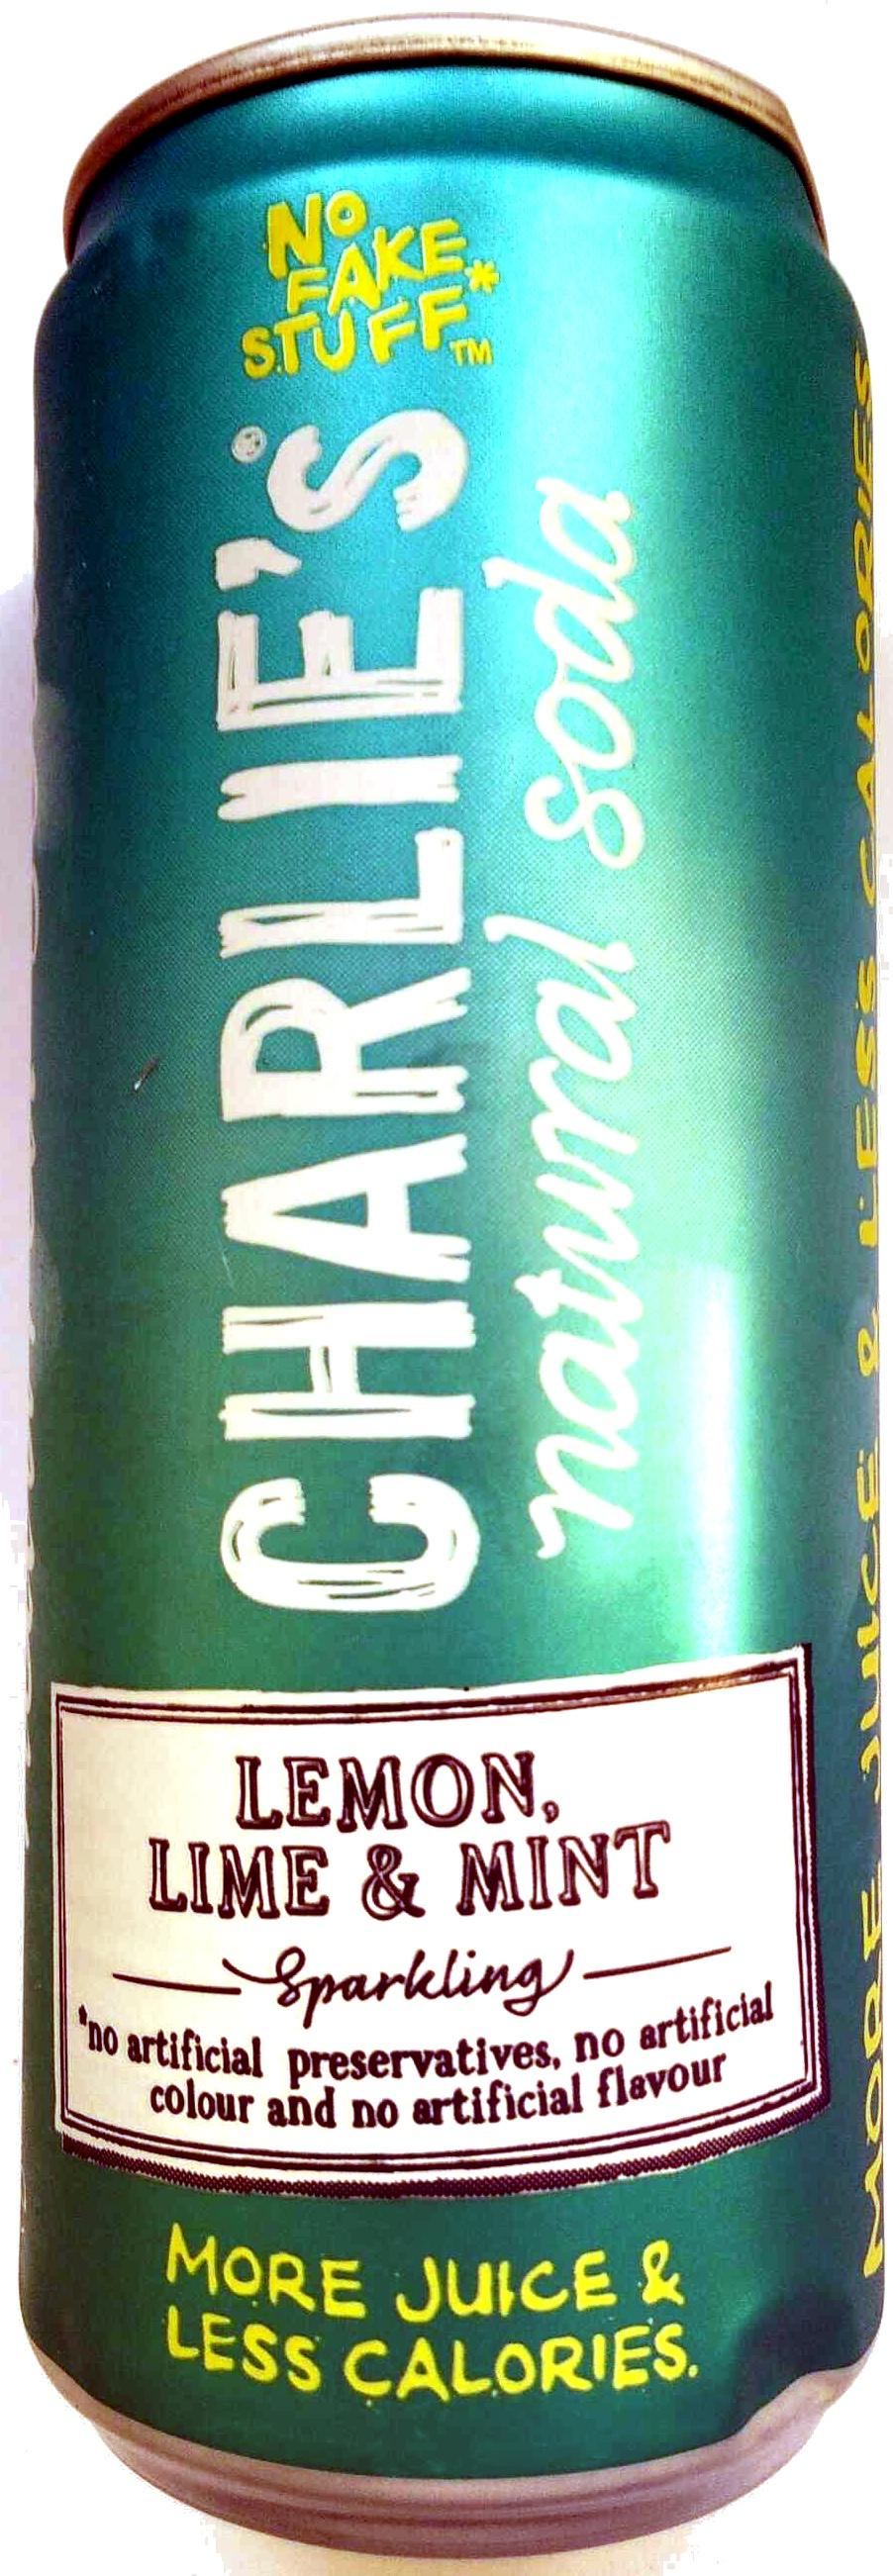 Charlie's Lemon, Lime & Mint Natural Soda - Produit - fr